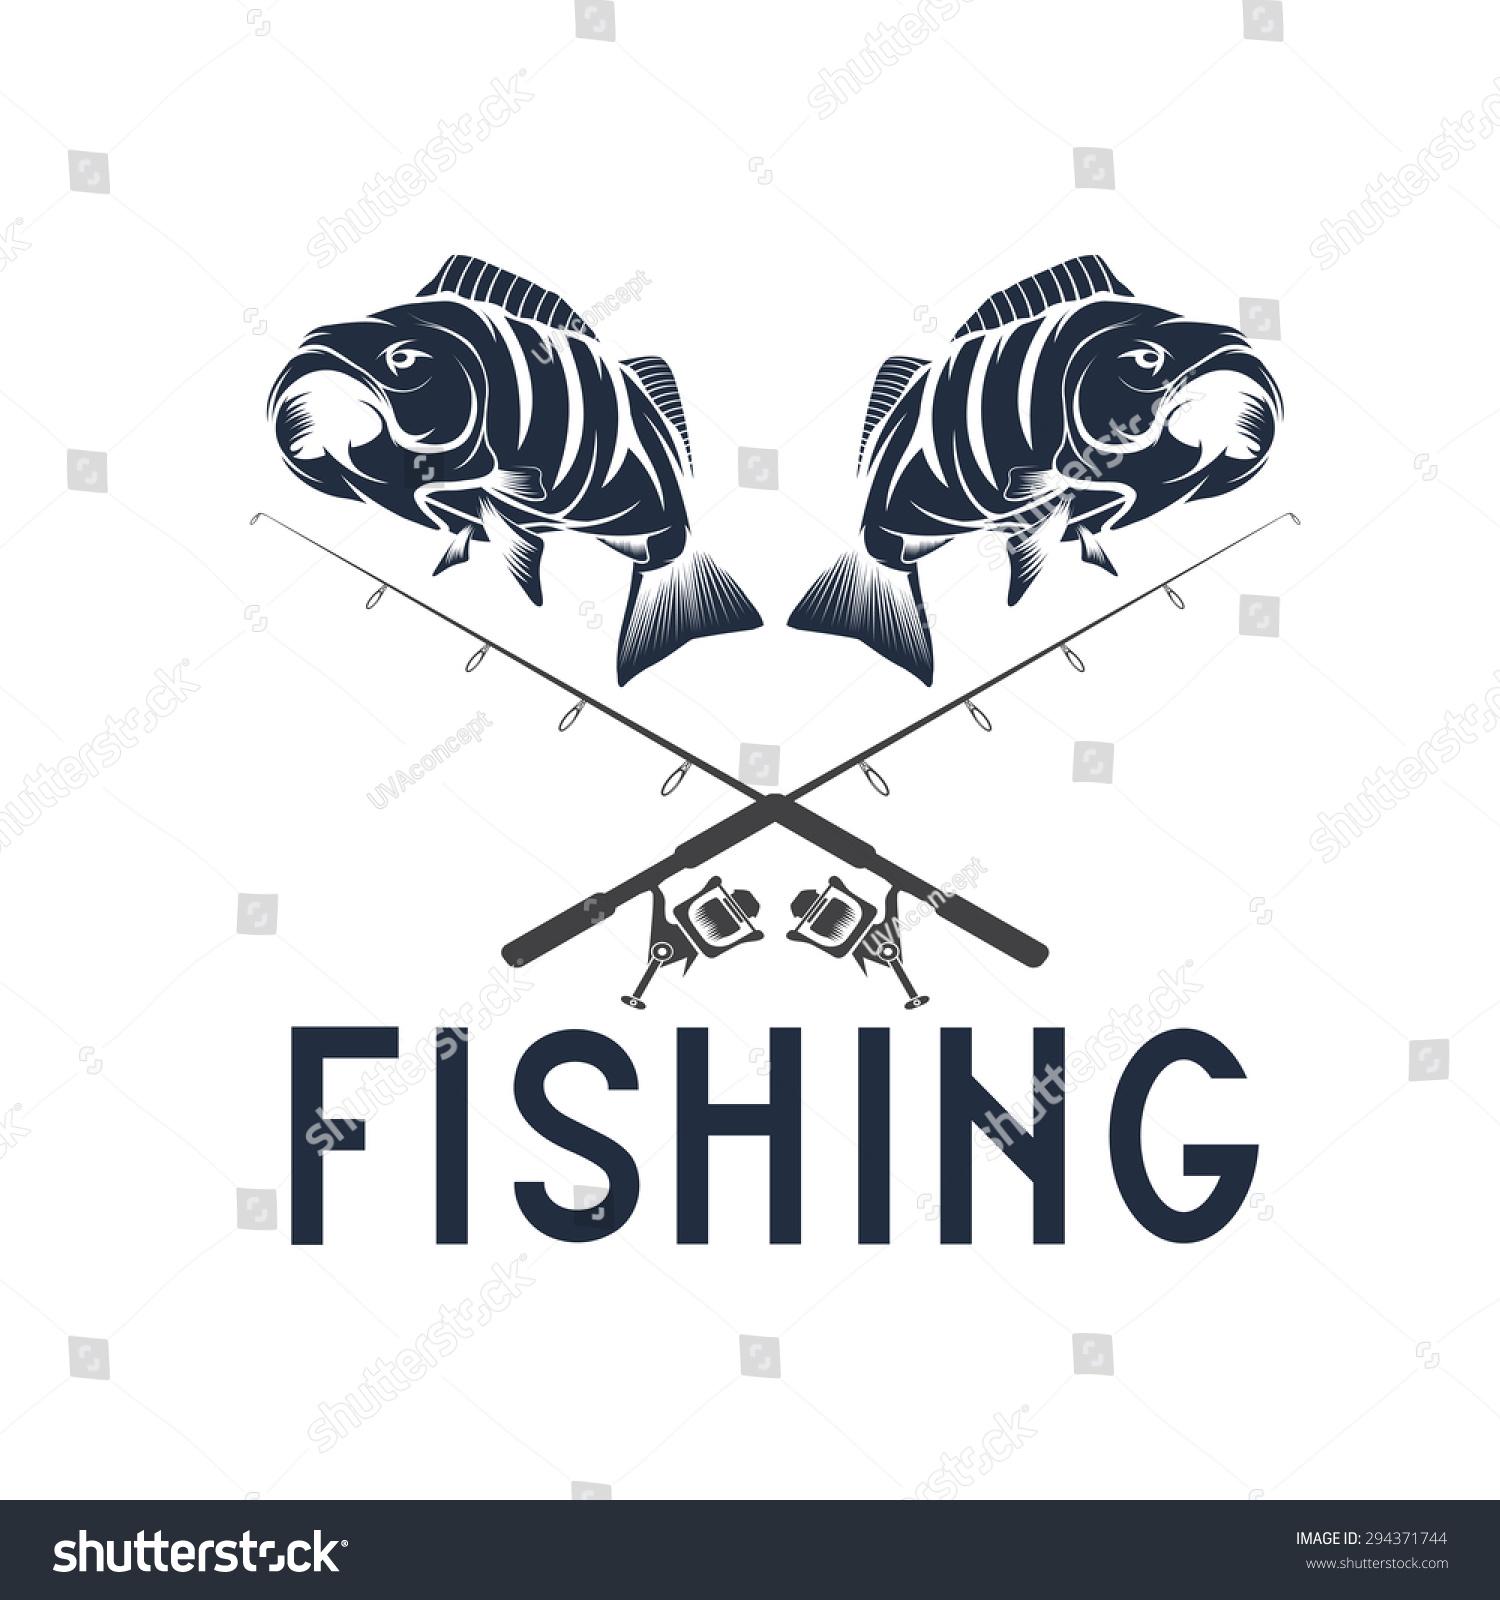 Vintage Fishing Vector Design Template Stock Vector 294371744 ...